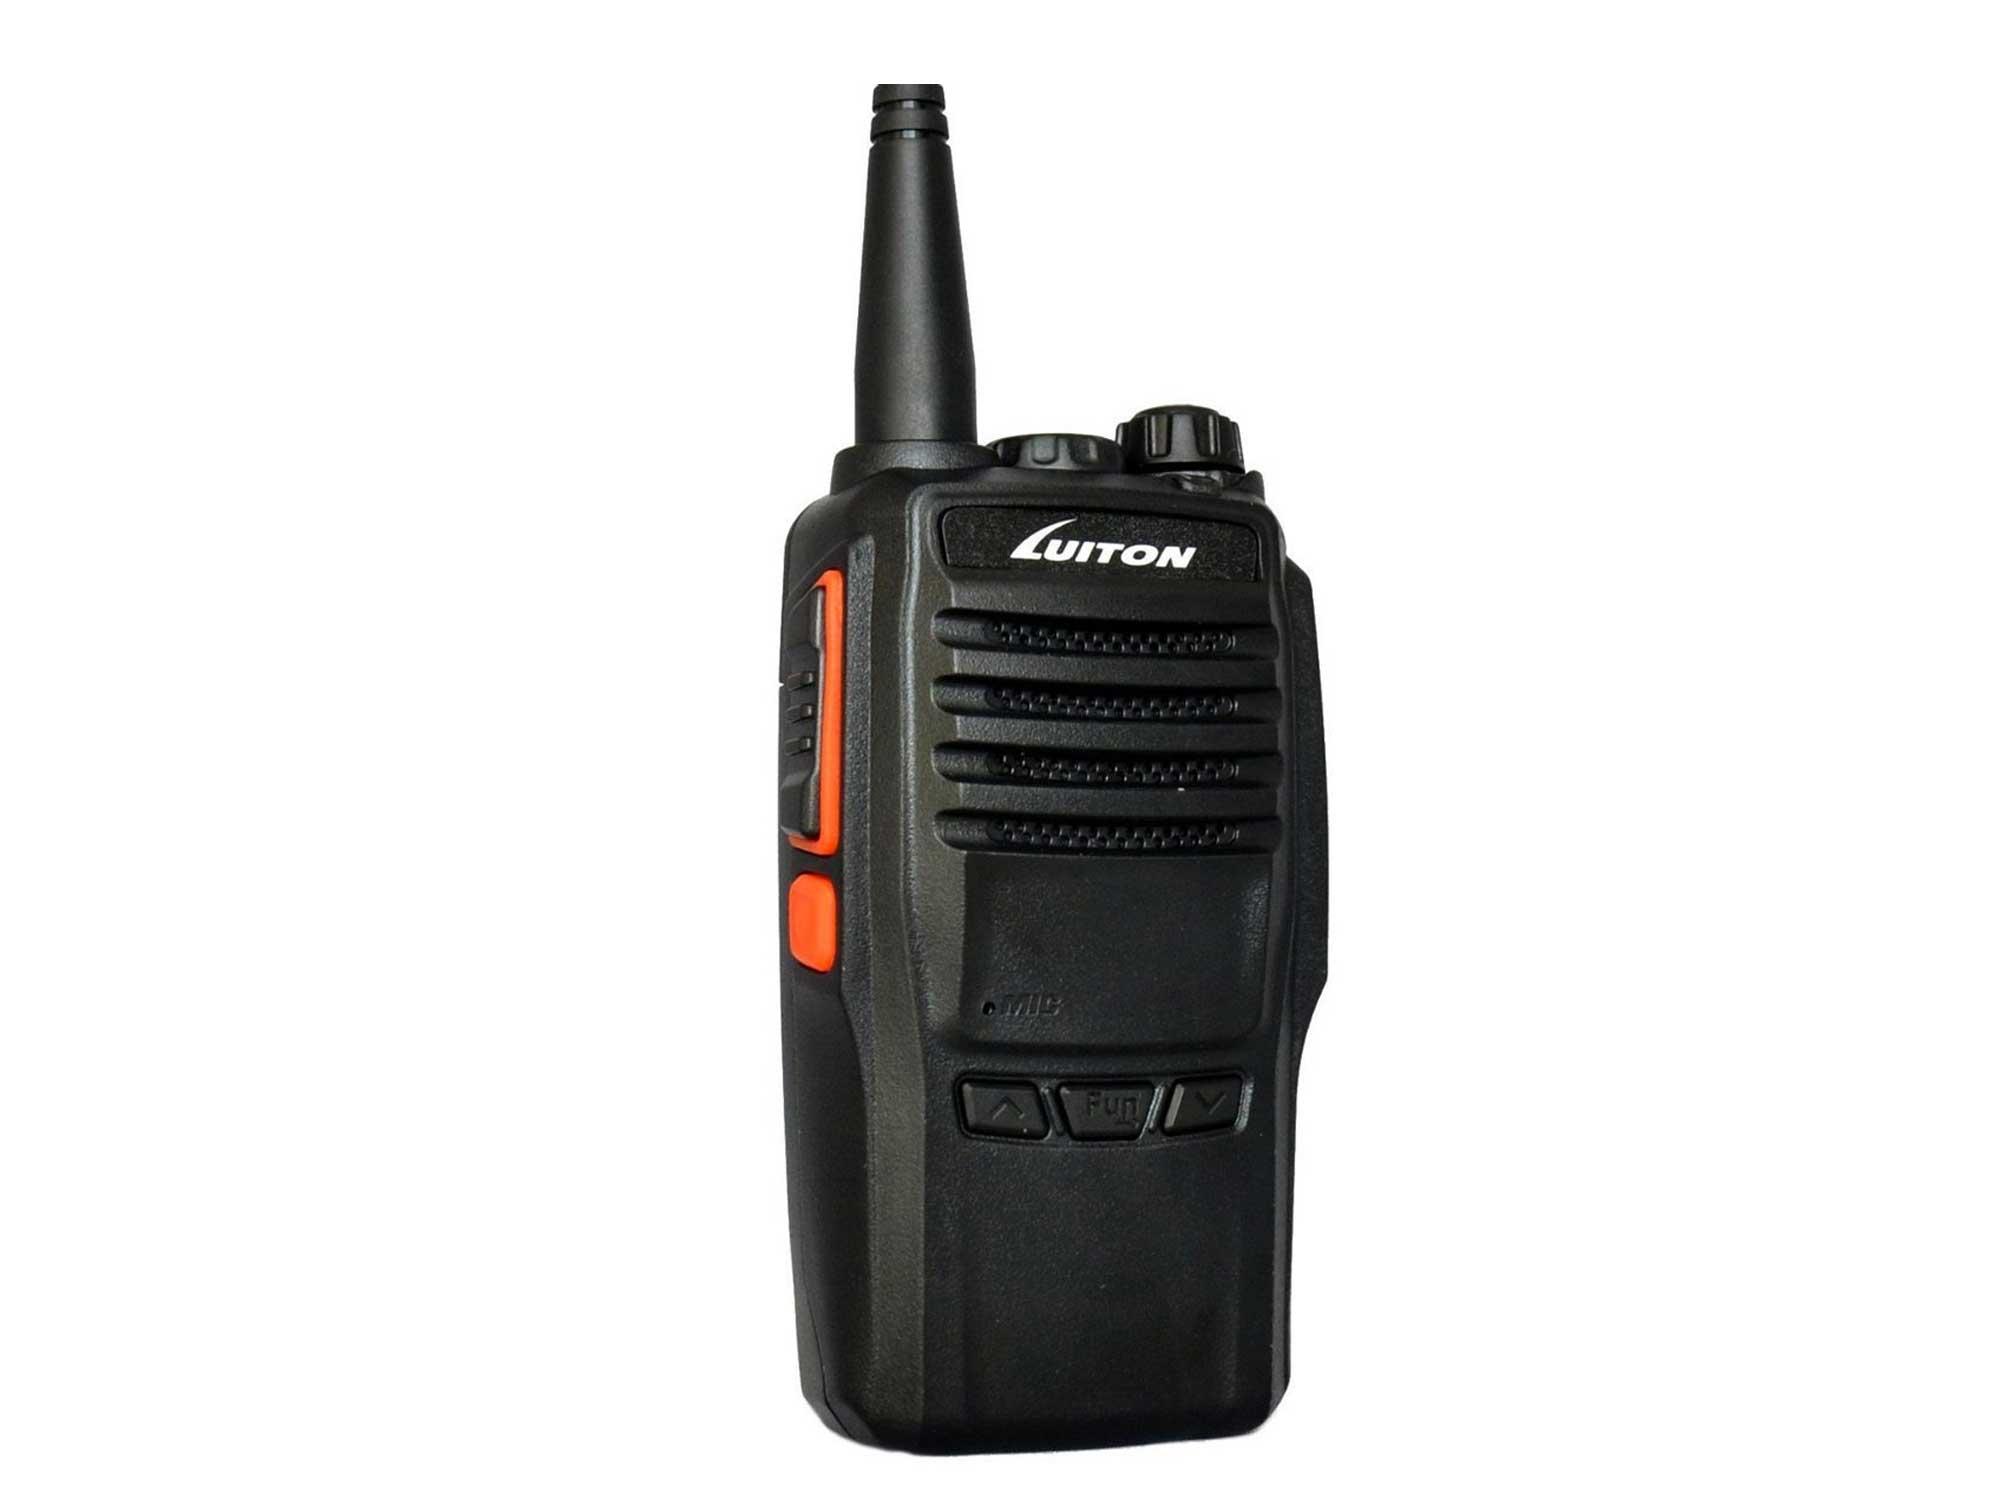 Luiton UHF radio